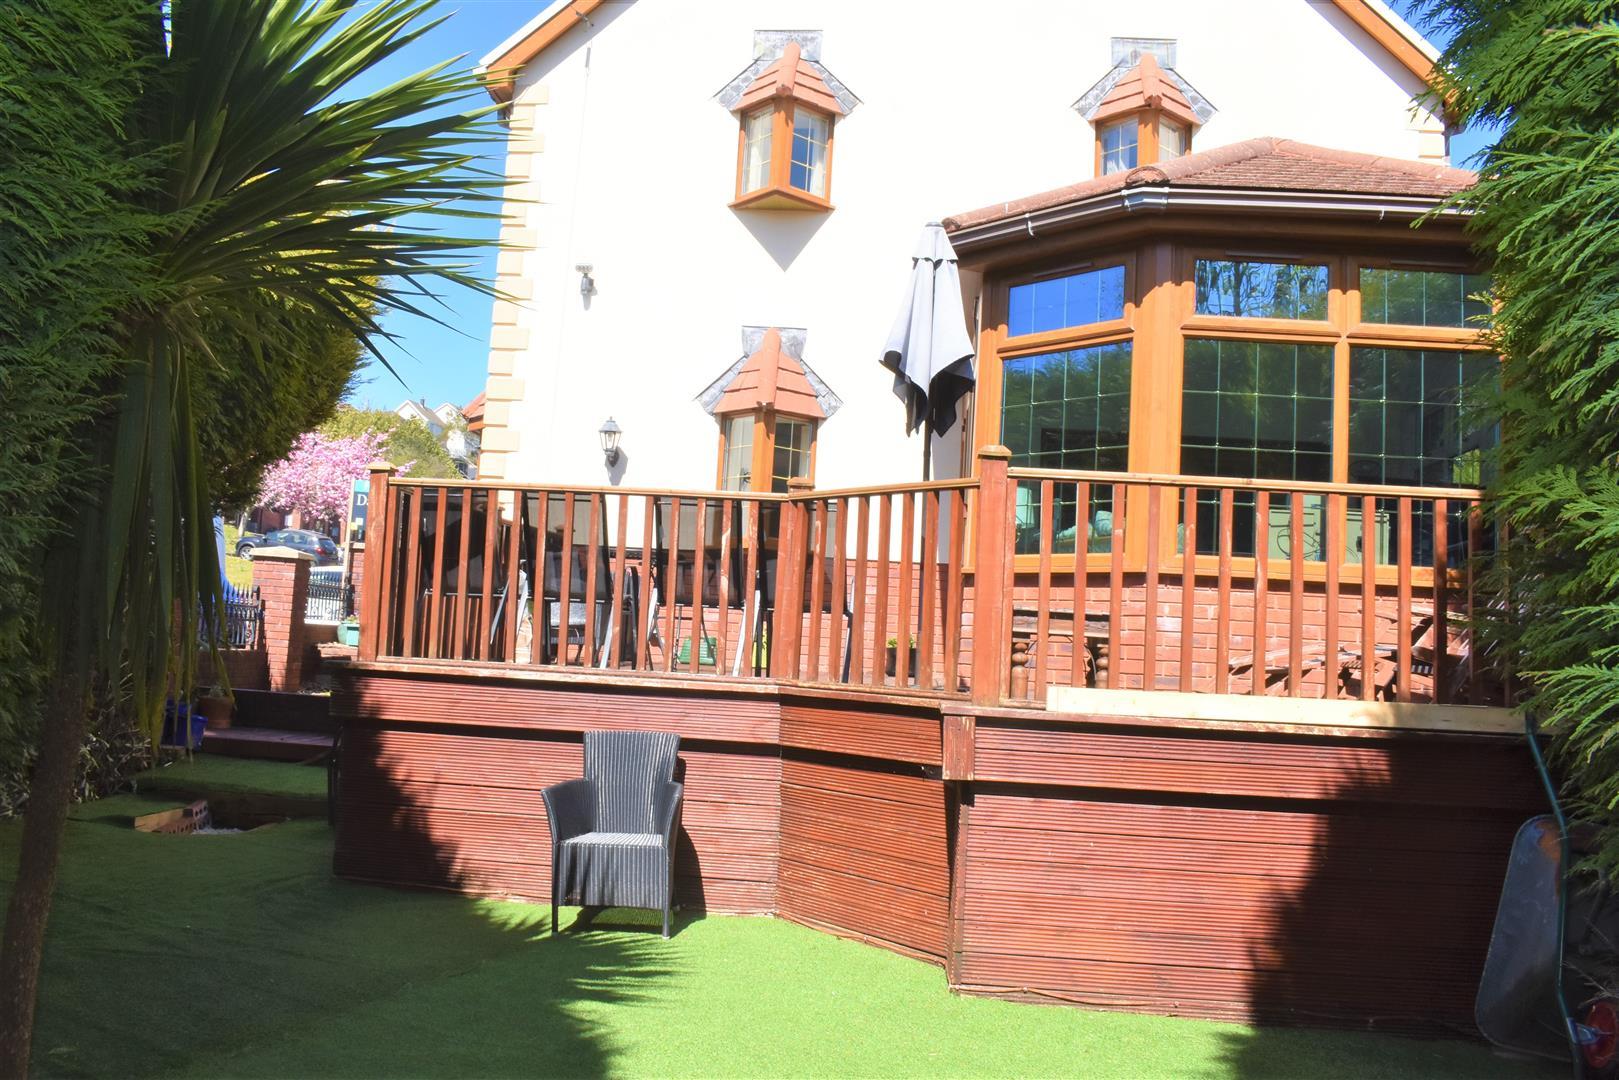 Coniston Walk, Tycoch, Swansea, SA2 9FD